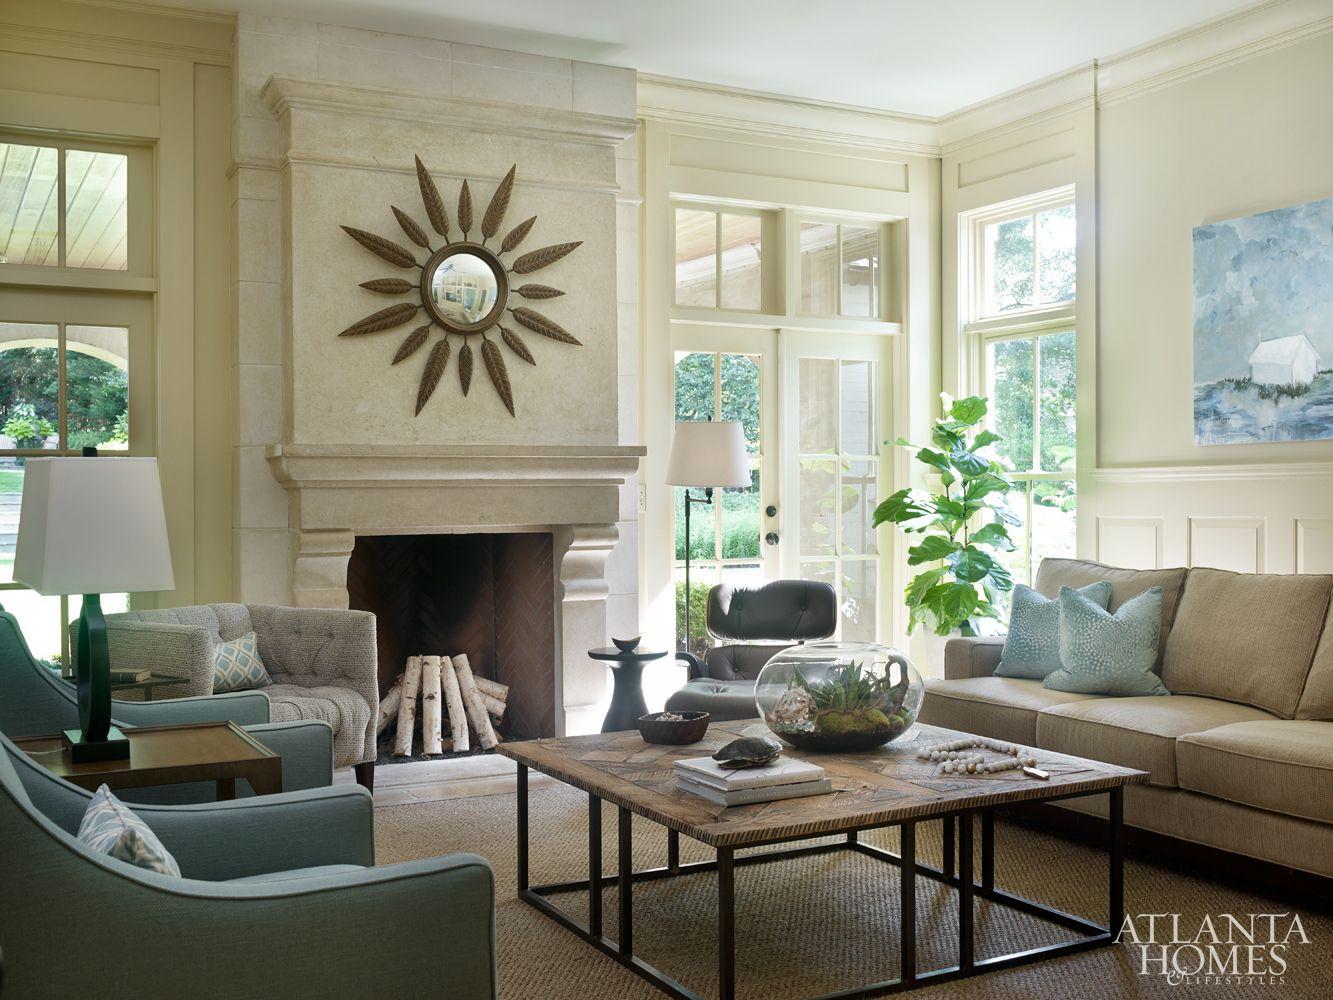 in the light filled family room bosbyshell selected streamlined furnishings